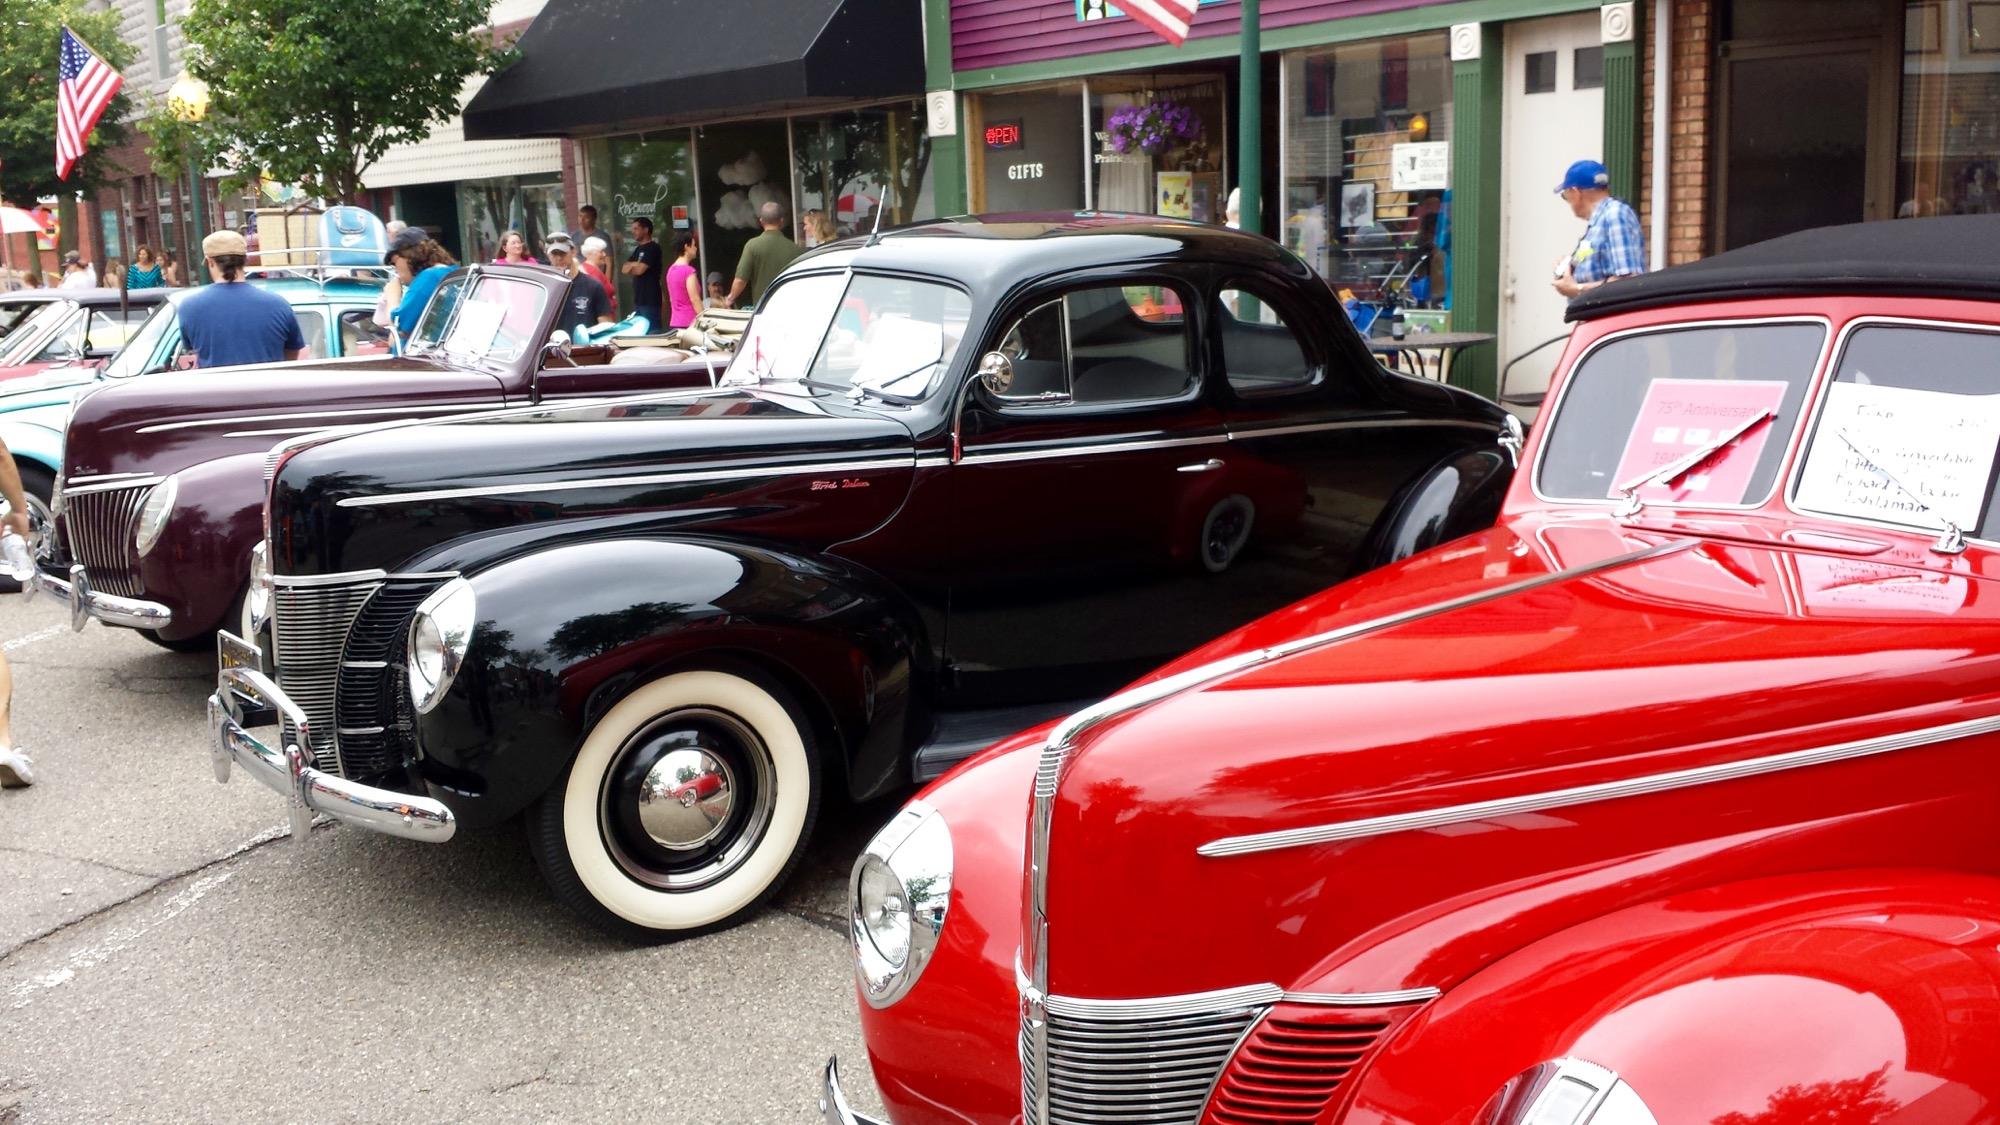 Vicksburg Old Car Festival